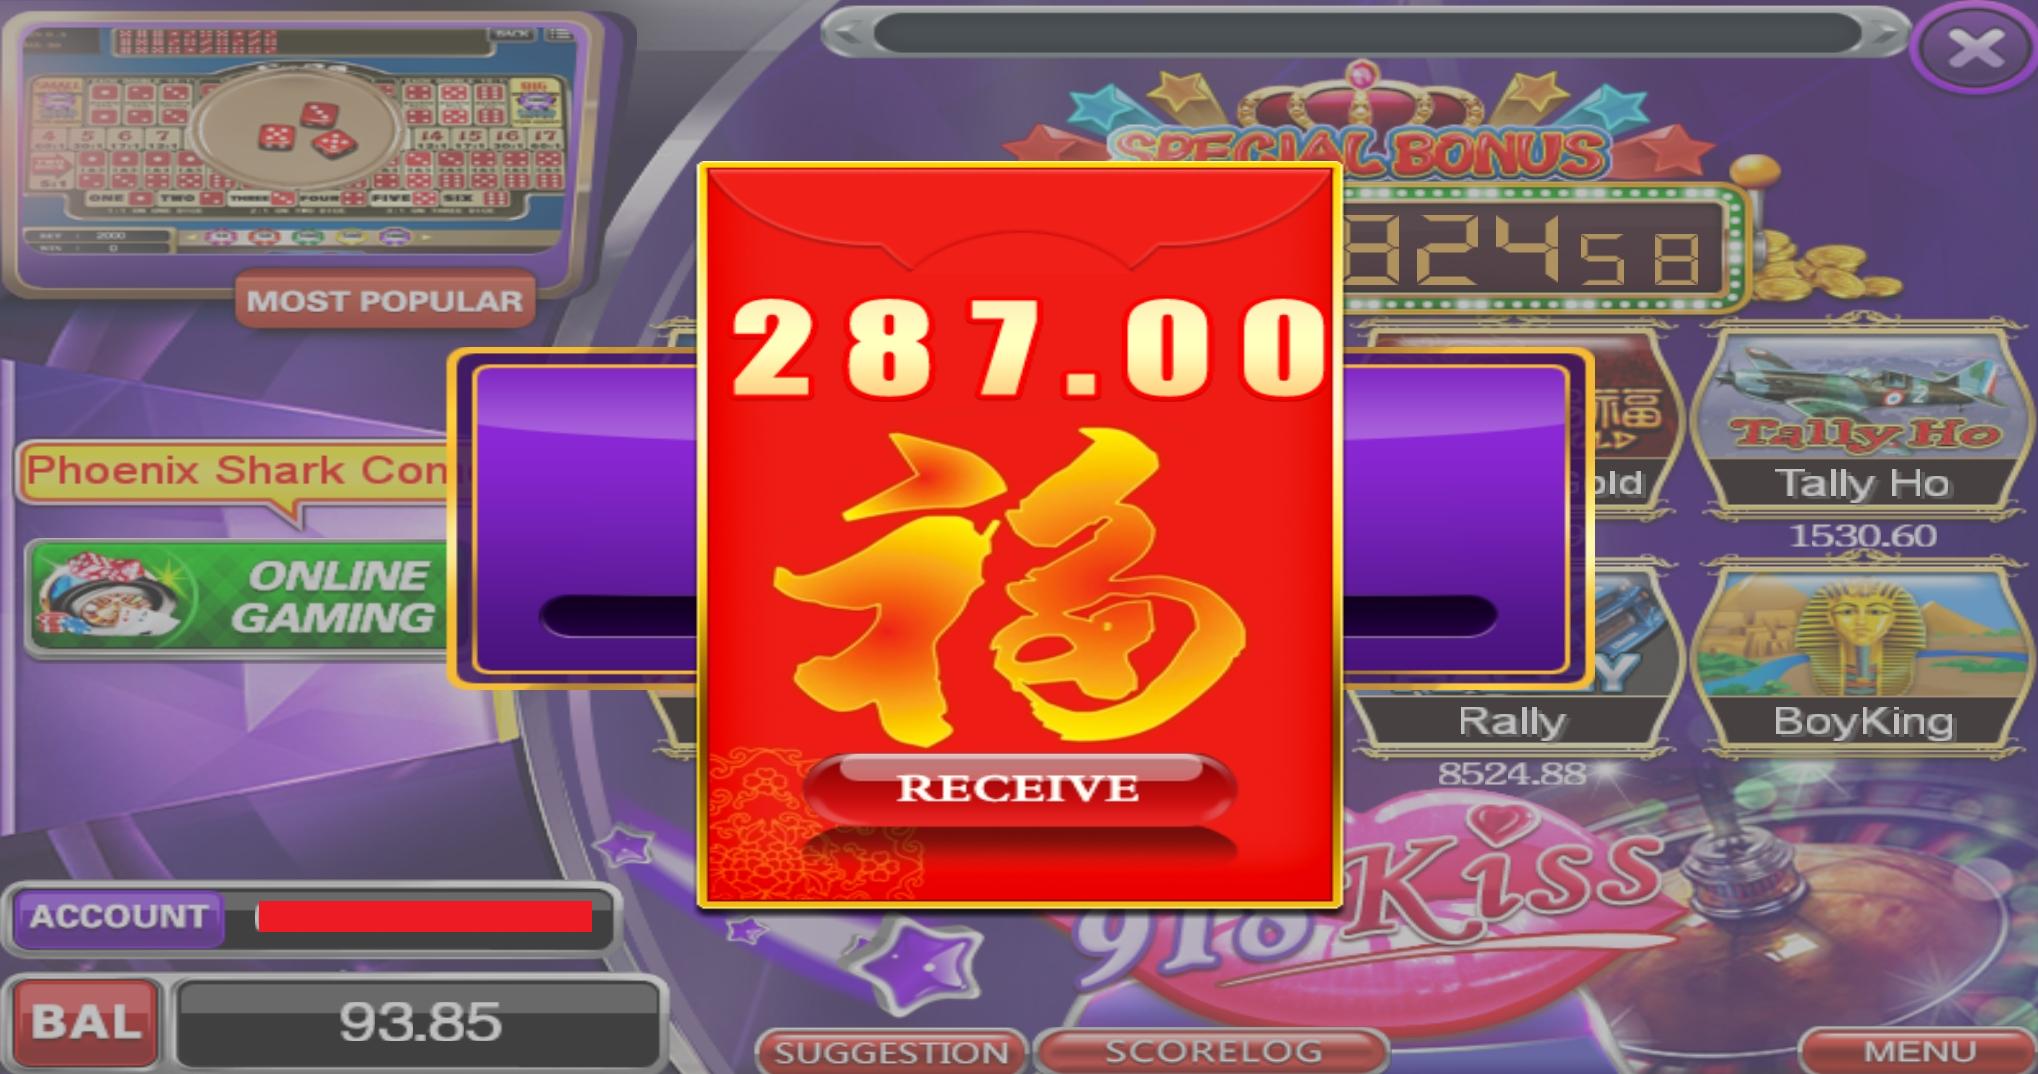 Tahniah Member Terkena Angpow yang BESAR dalam game 918Kiss , RM287.00 !!!